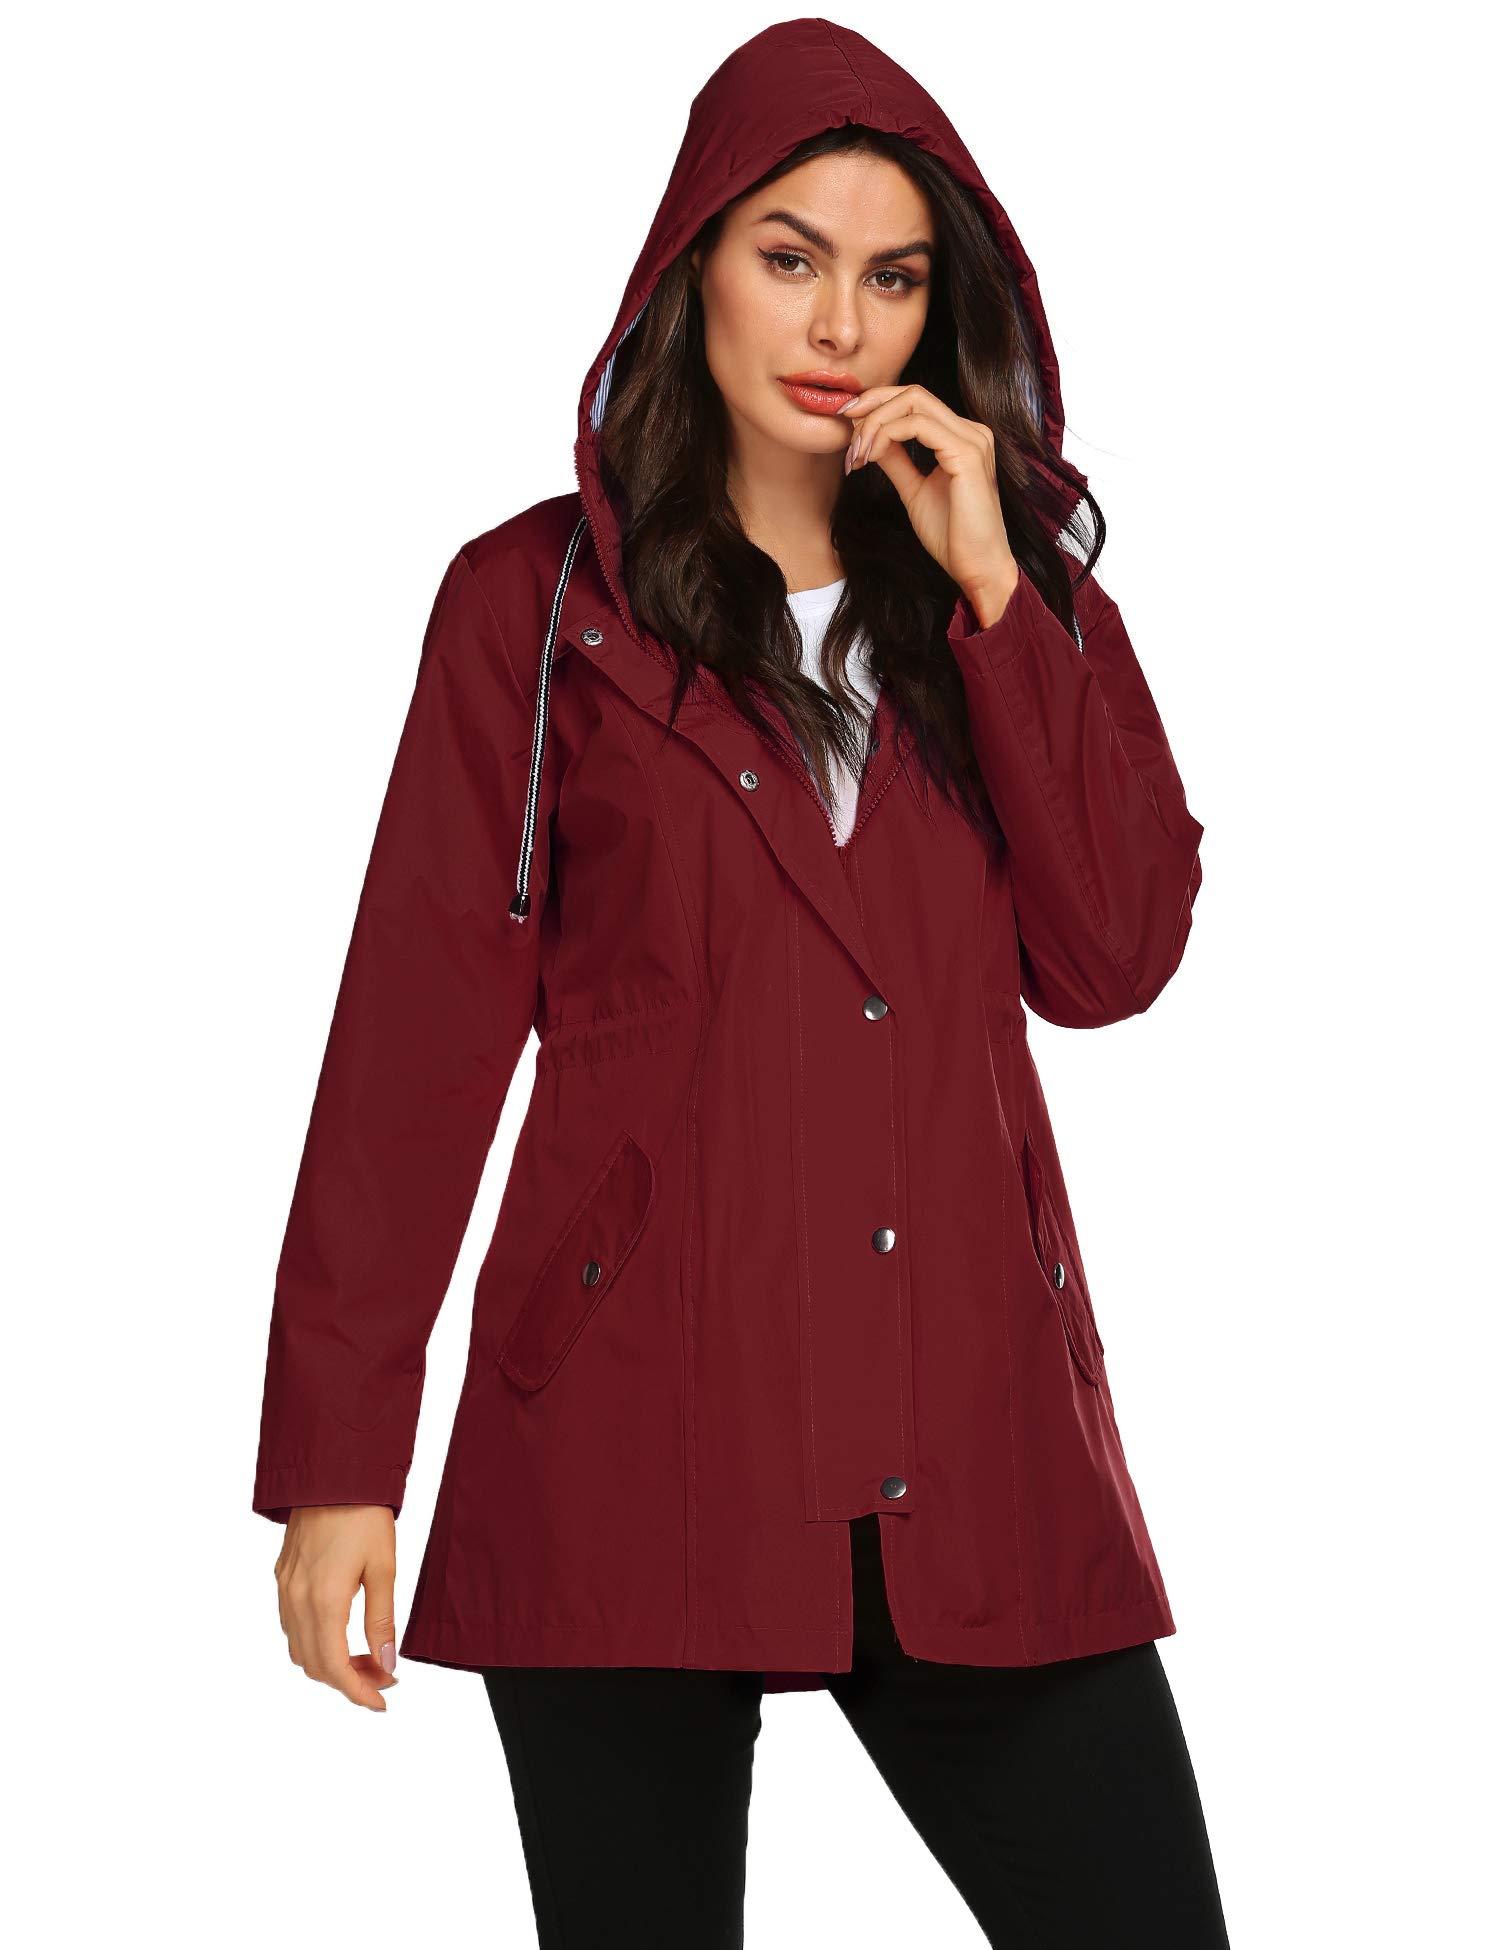 Women Lightweight Packable Raincoat Hooded Waterproof Raincoat Hiking Packable Jackets Wind Red S by Avoogue